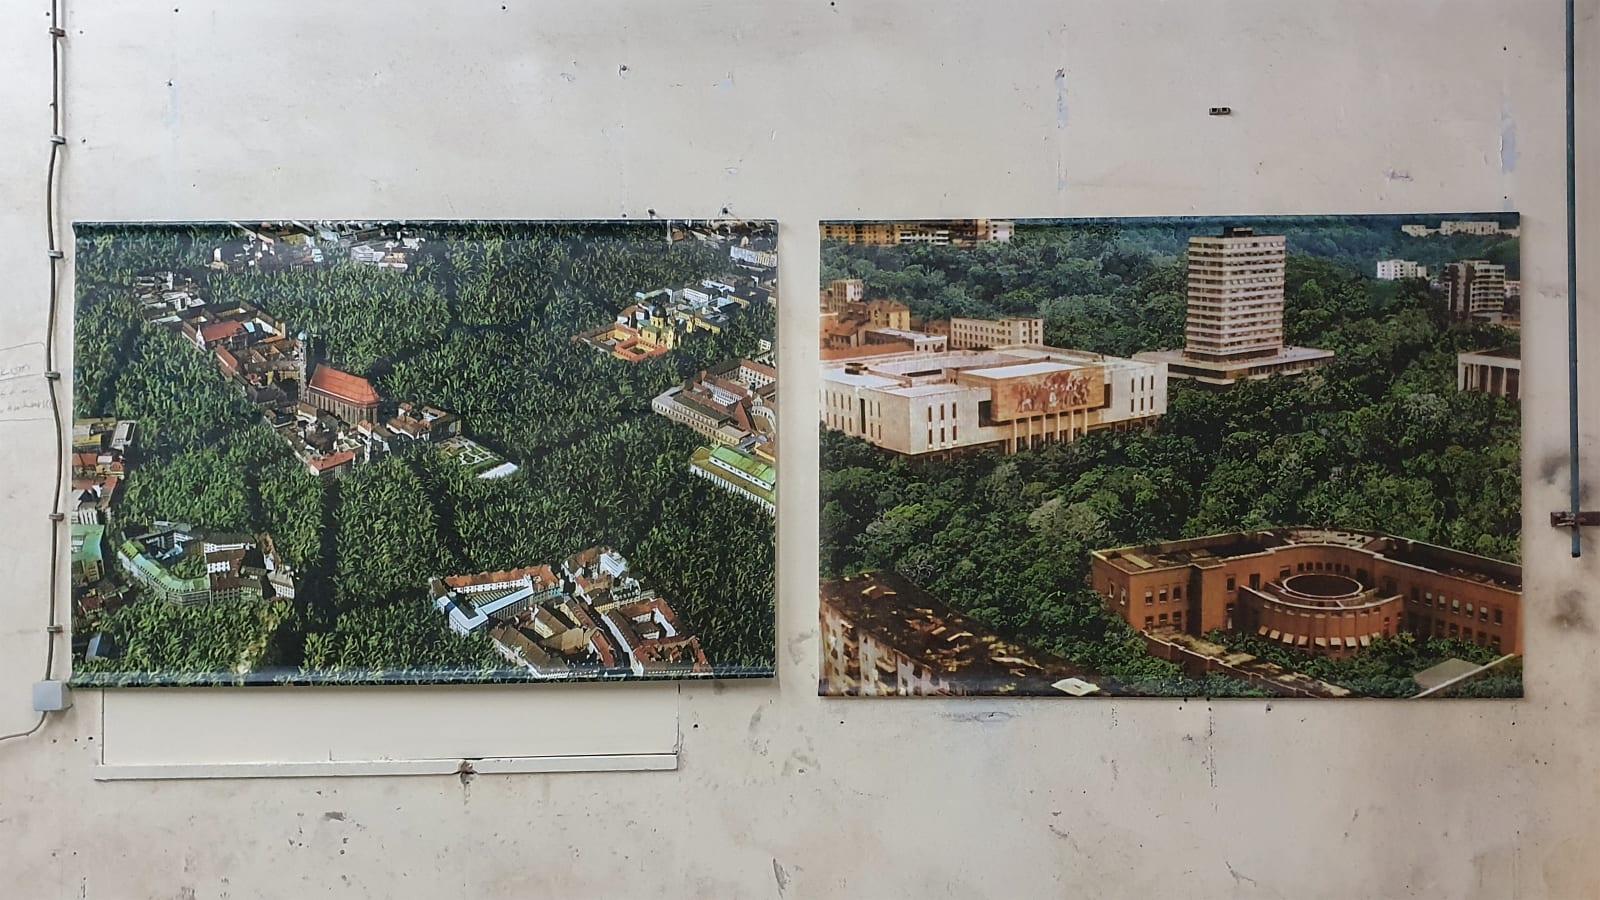 Bert_Theis_Aggloville_3rd_industrial_art_biennal_2020_croatia